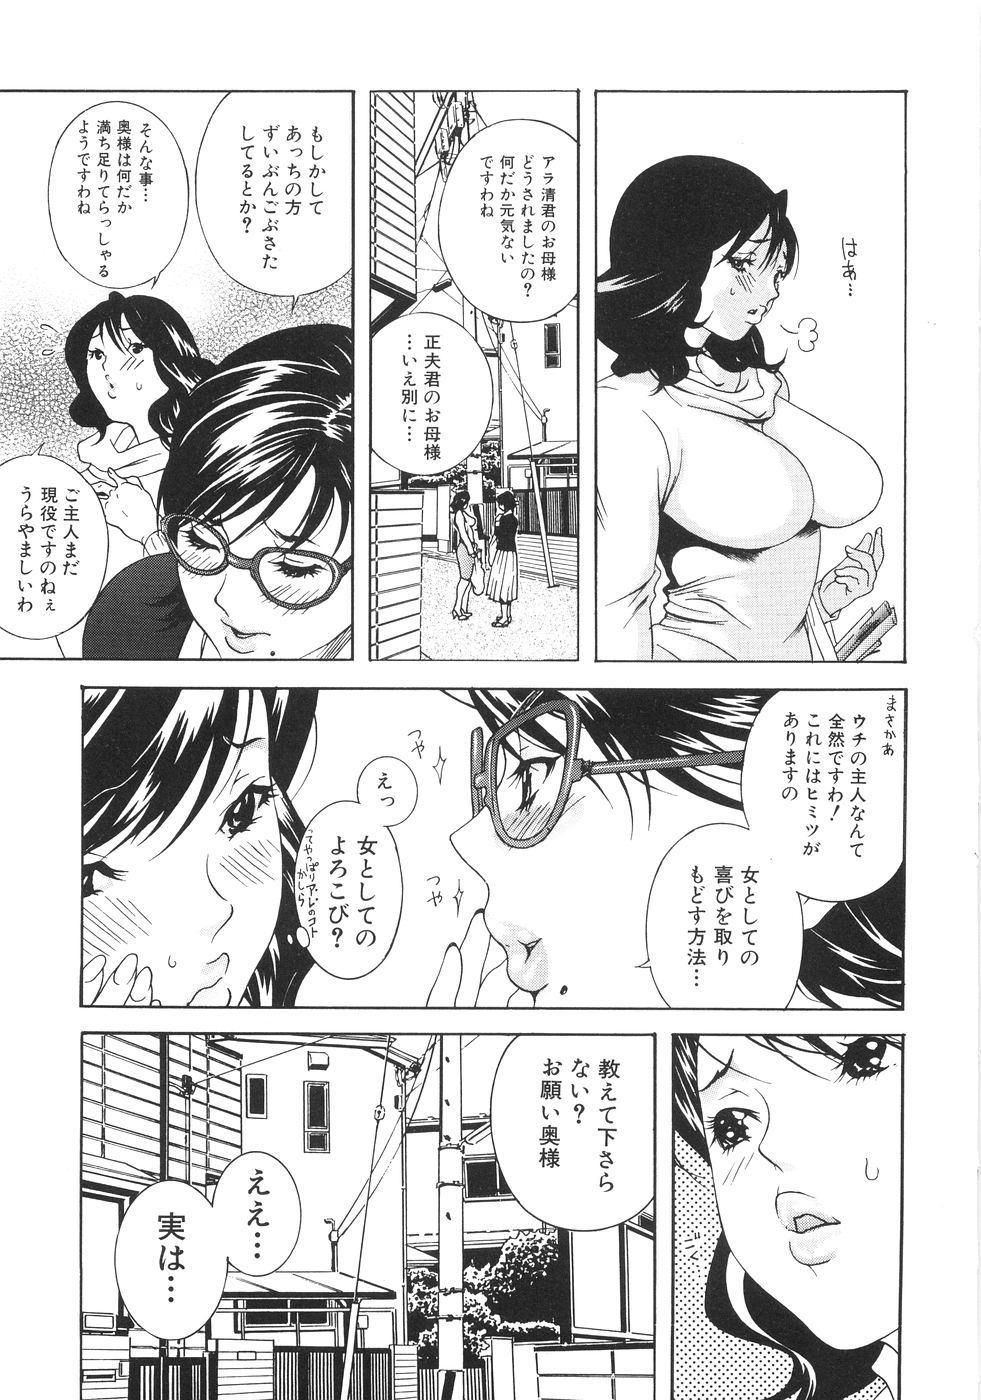 Honki Jiru - Cowper's Gland Liquid? or Love Juice?...?! 15